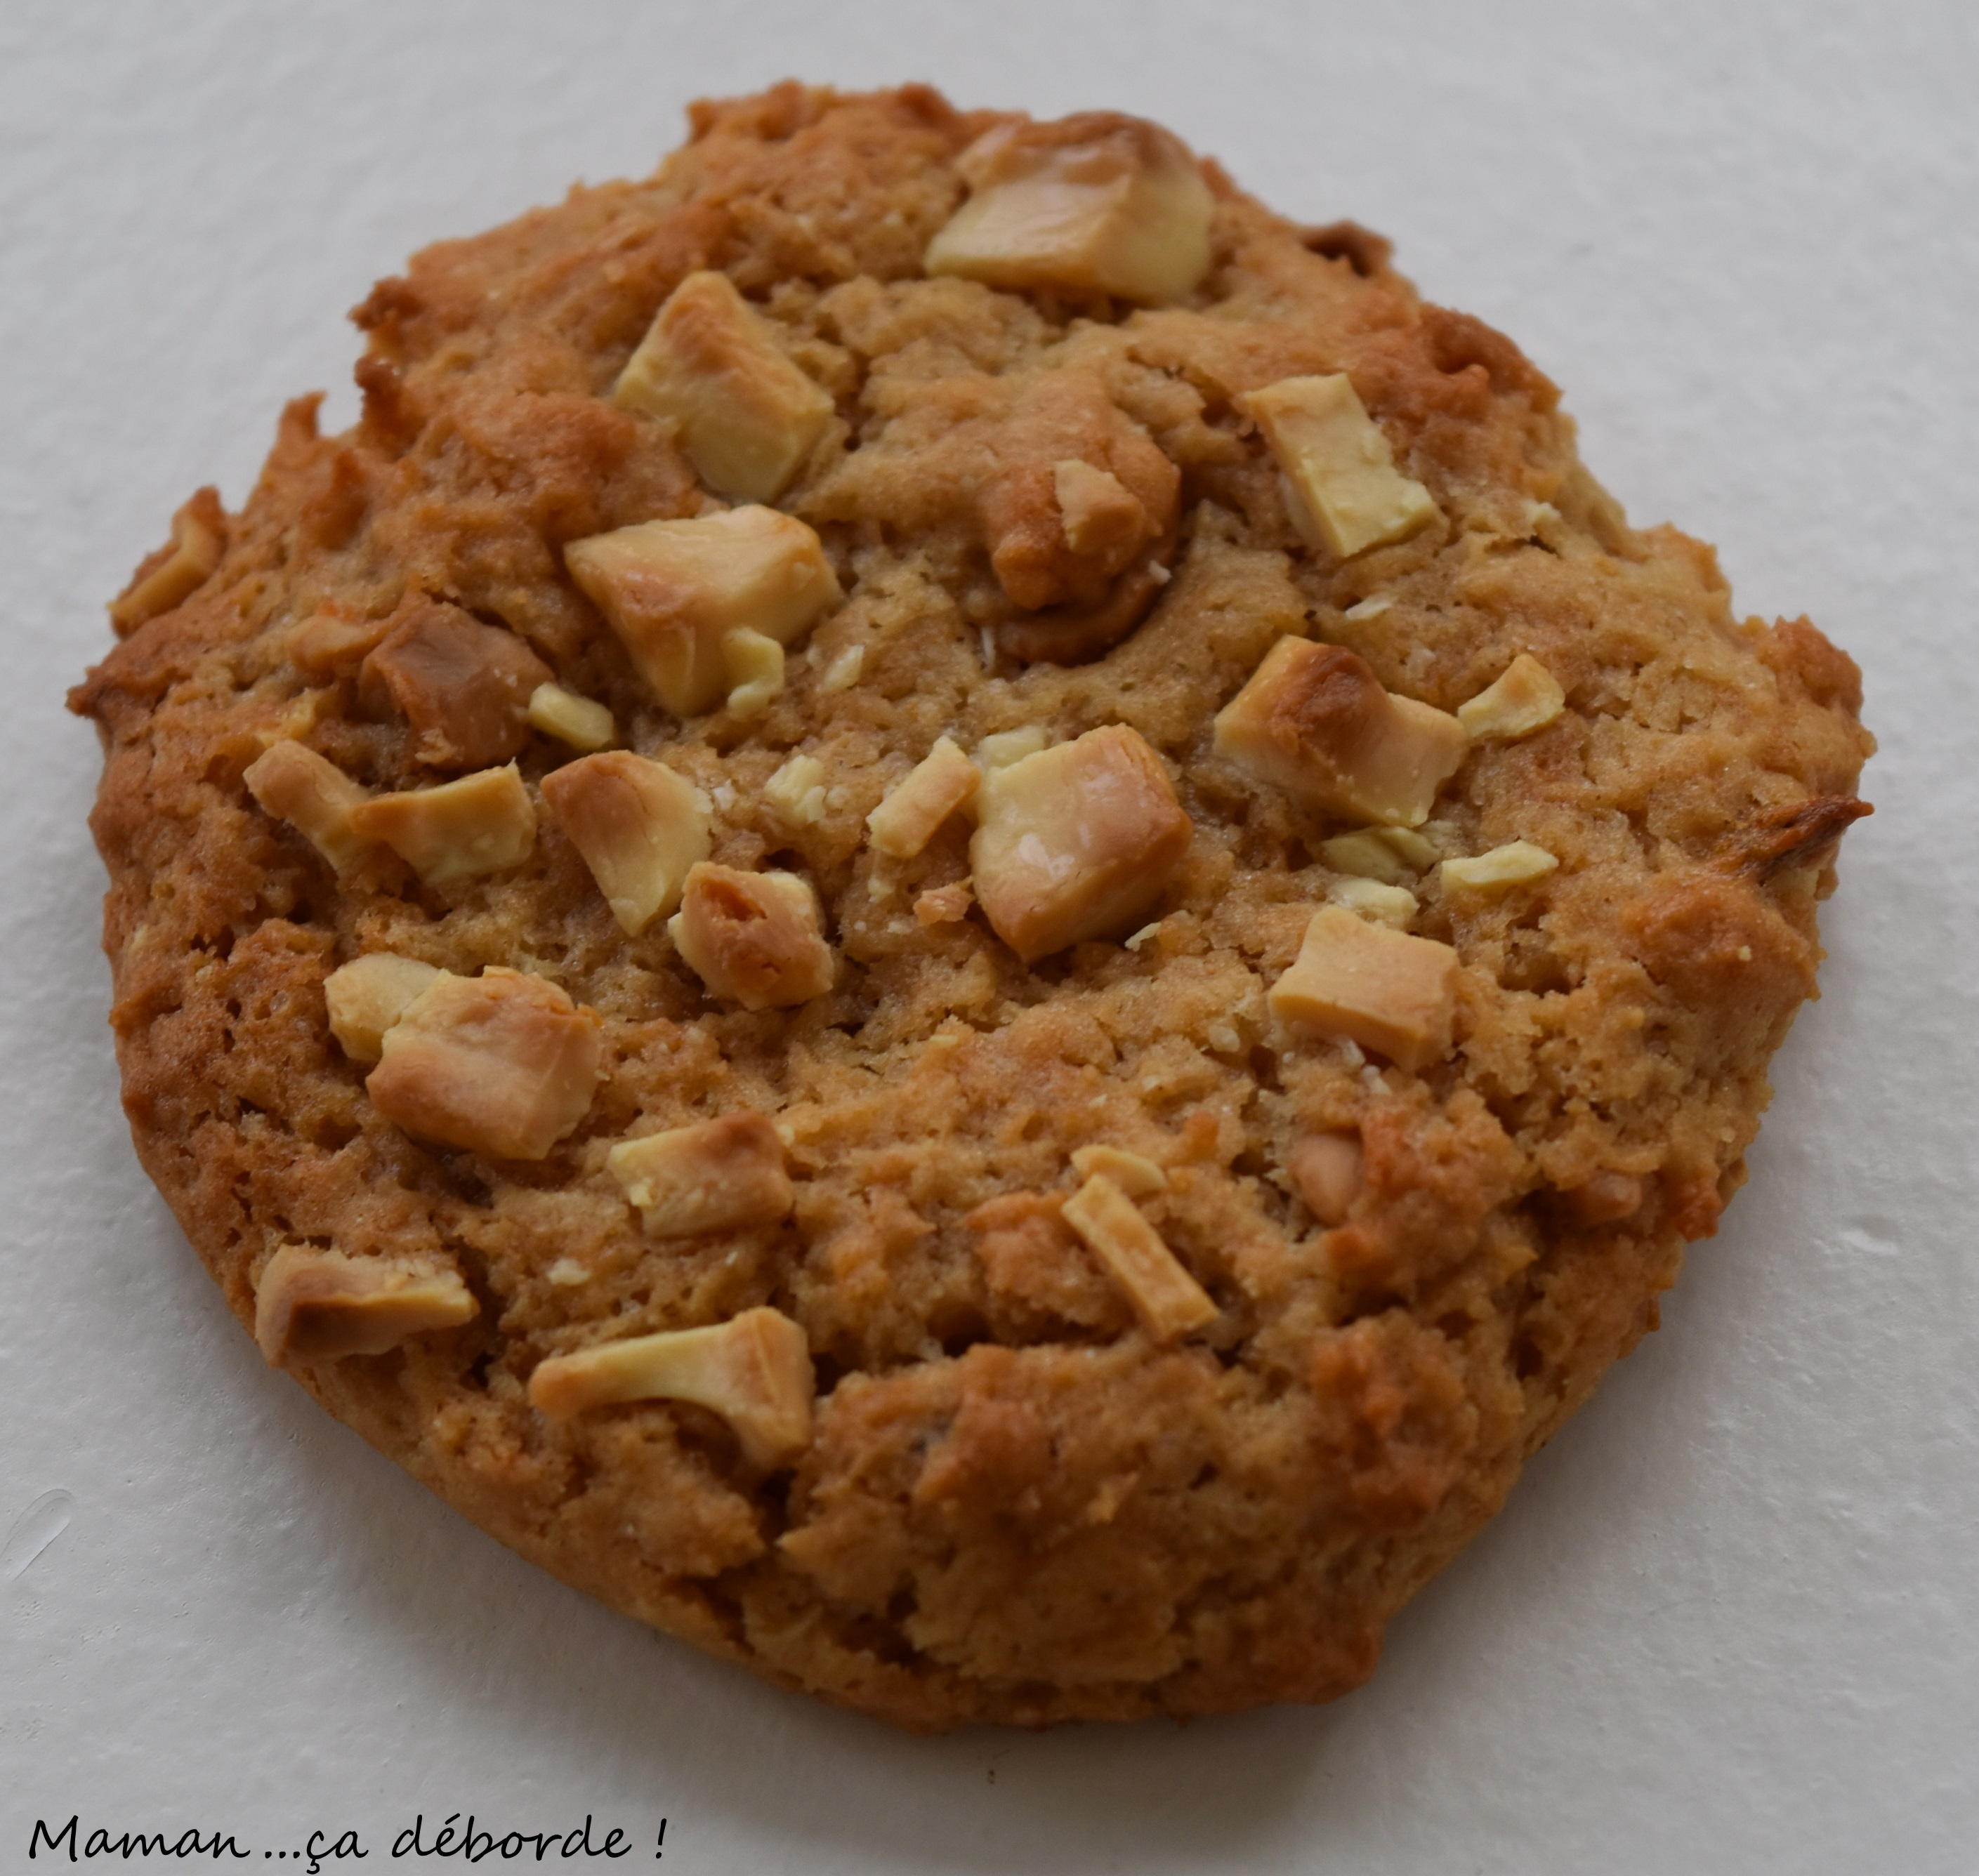 Cookies banane et beurre de cacahu tes vegan maman - Cookies beurre de cacahuete ...